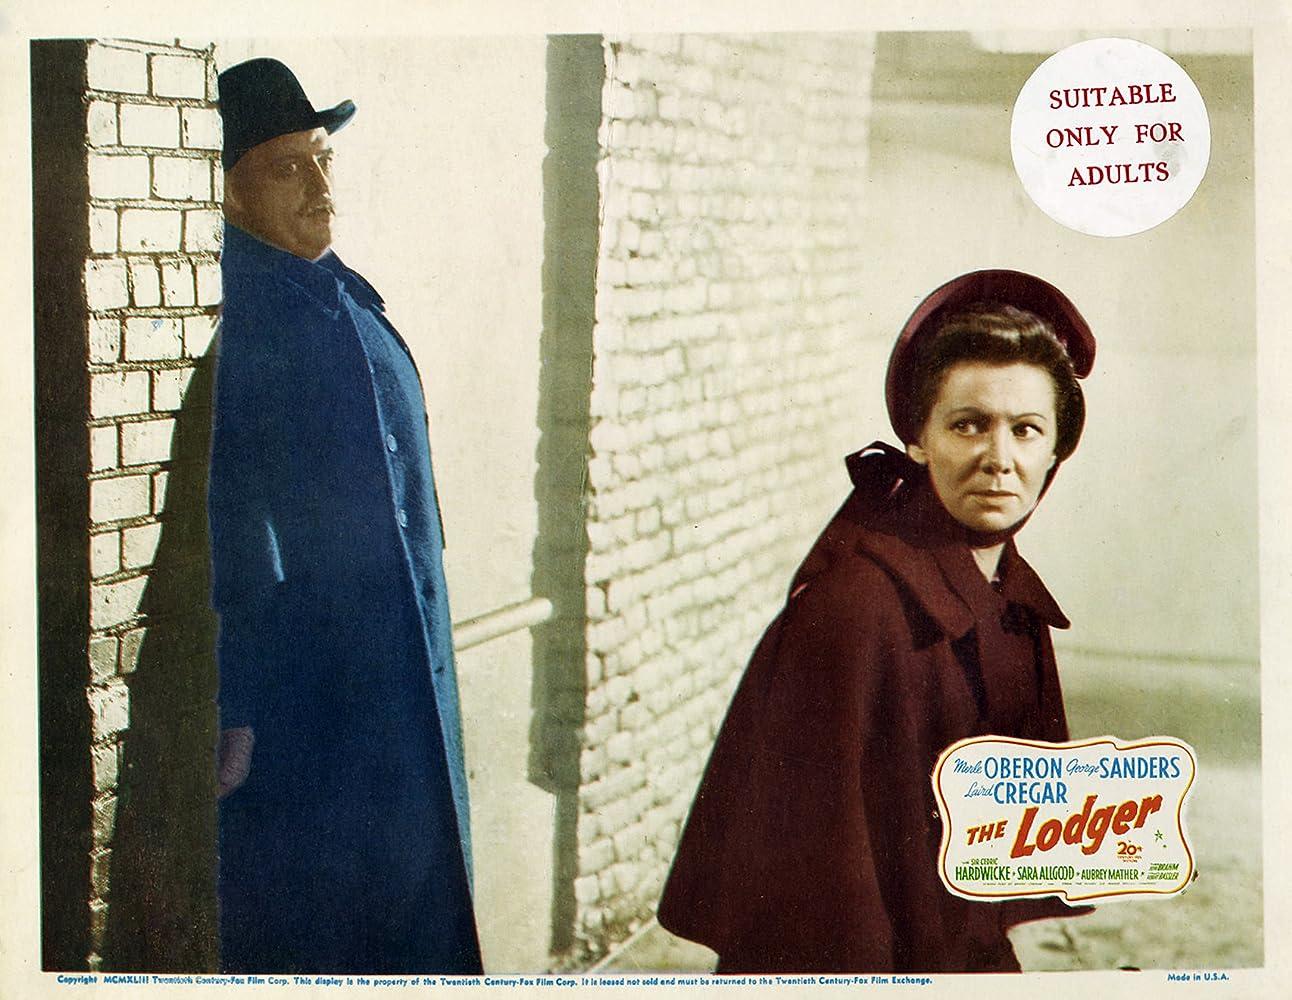 Scott McNeil,Missy O'Reilly Porno image Kellie Crawford,Kenneth More (1914?982)